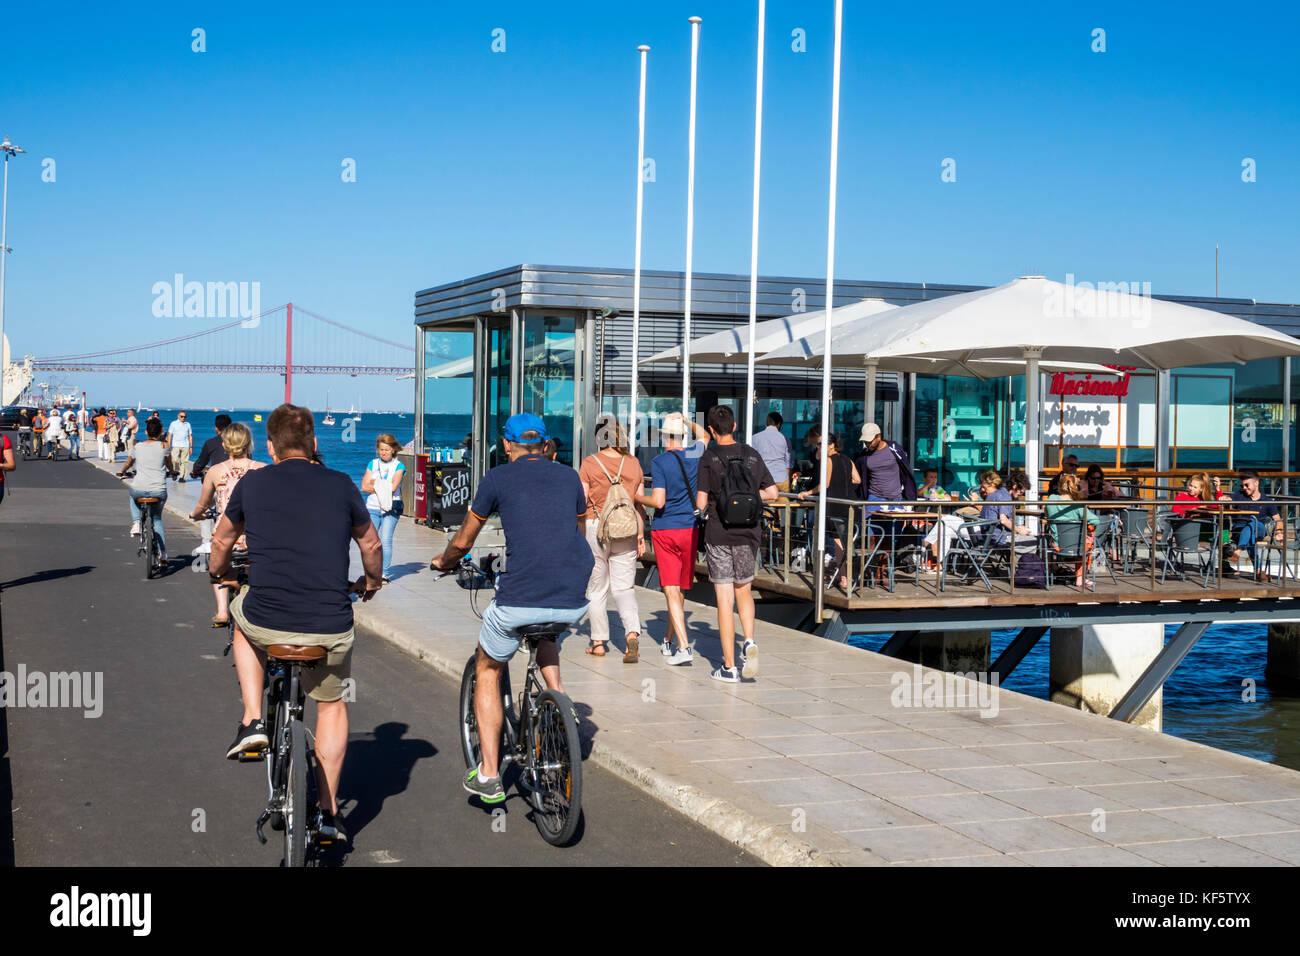 Lisbon Portugal Belem Tagus River waterfront promenade Confeitaria Nacional cafe alfresco restaurant bicycle pedestrian - Stock Image